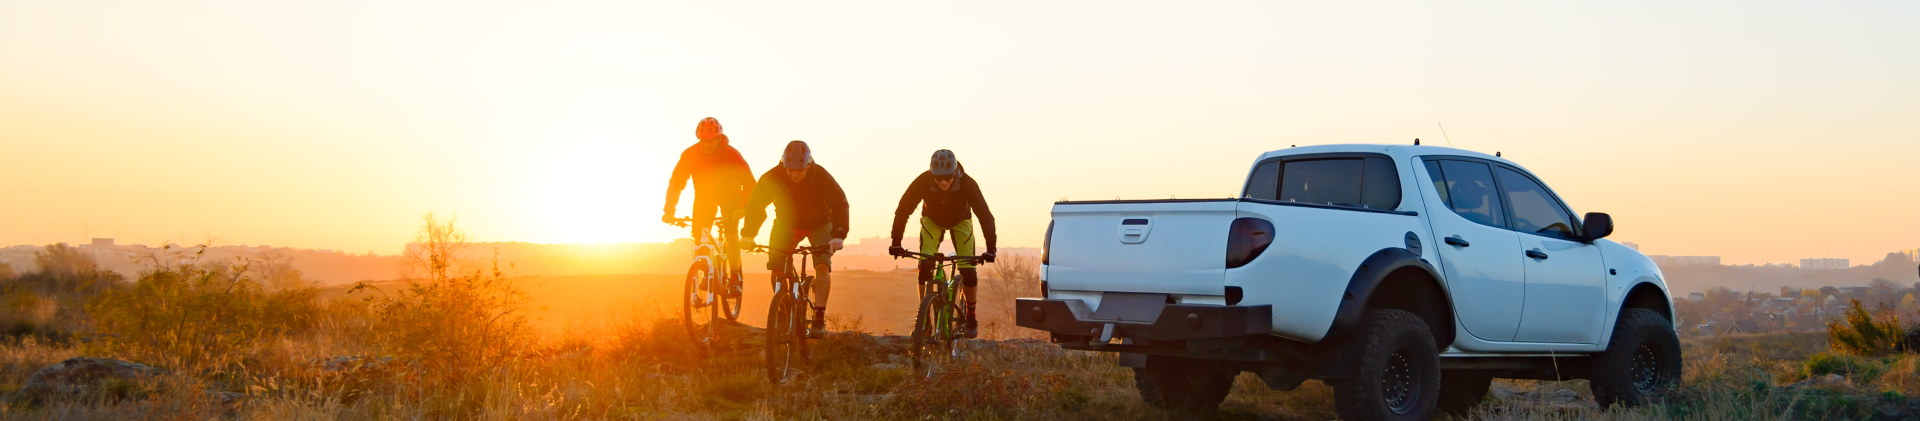 Truck, Sunset, Bikers